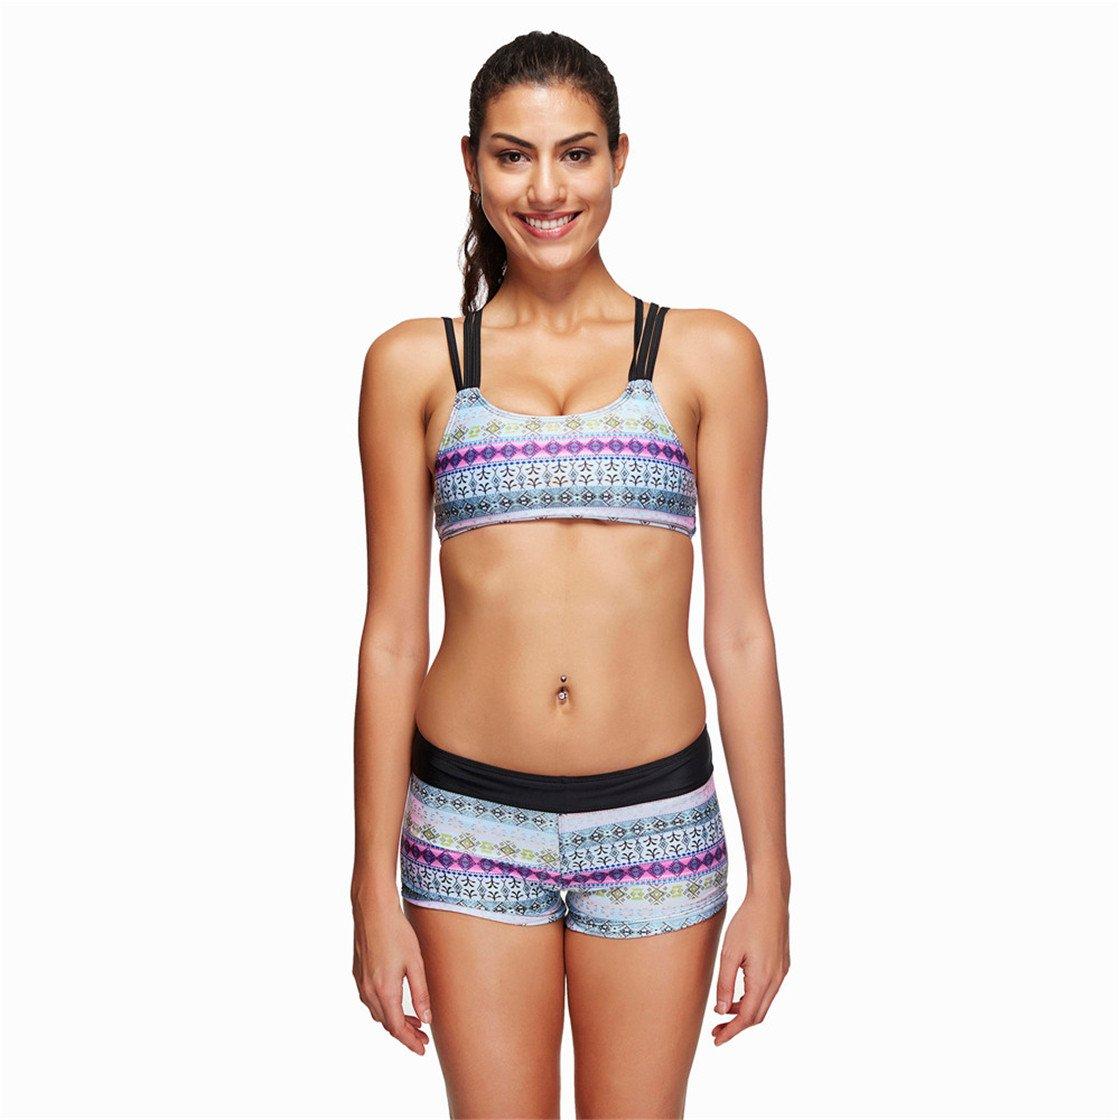 MOSE Women Sports Bikini Pure Color Beach Bathing Two Pieces Beachwear Set (Black, M)